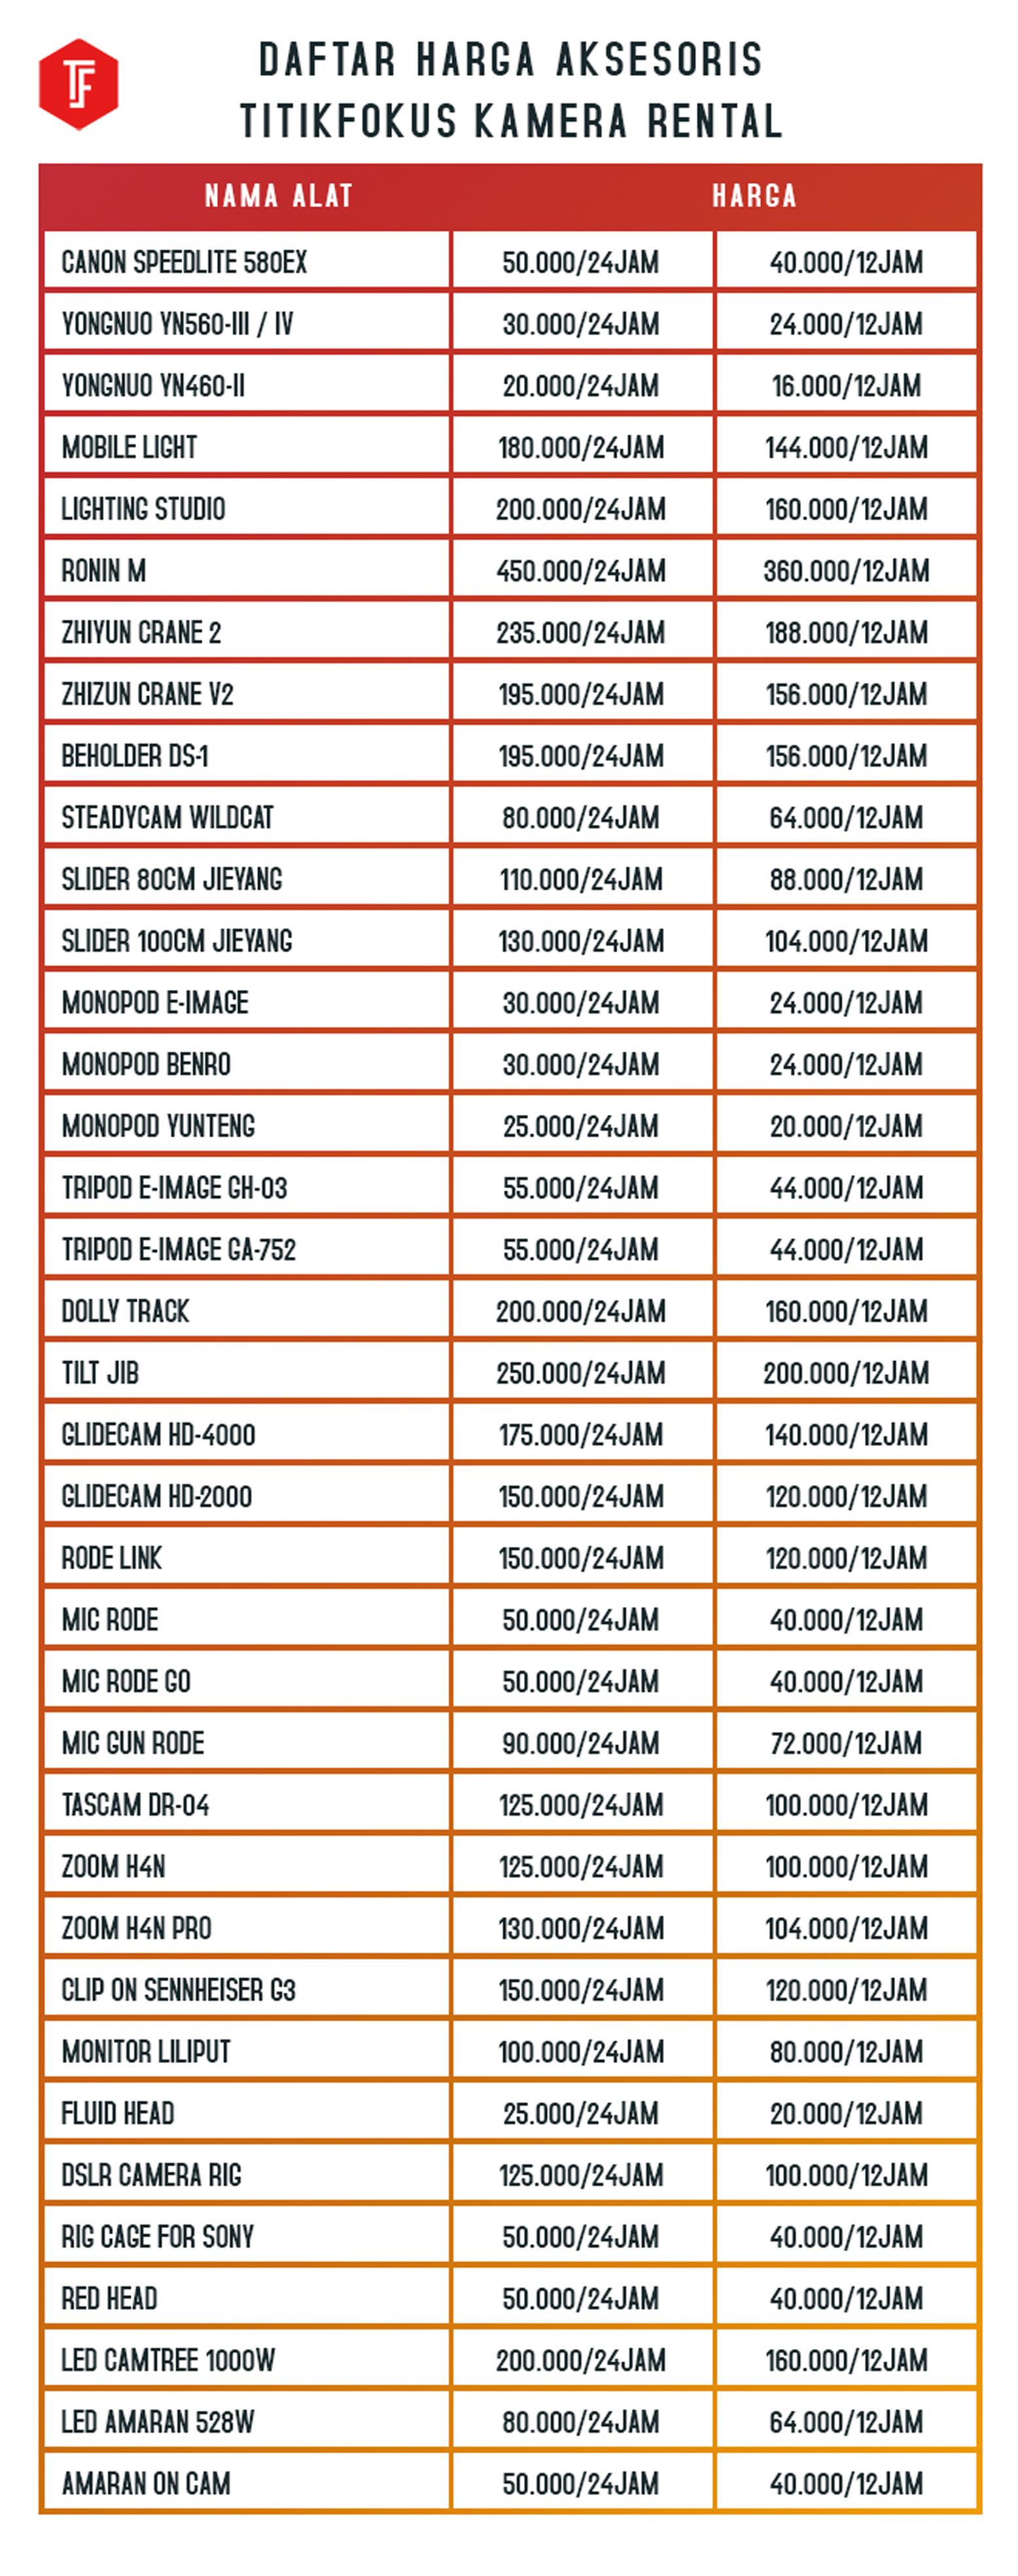 Daftar Harga TF Aksesoris Solo